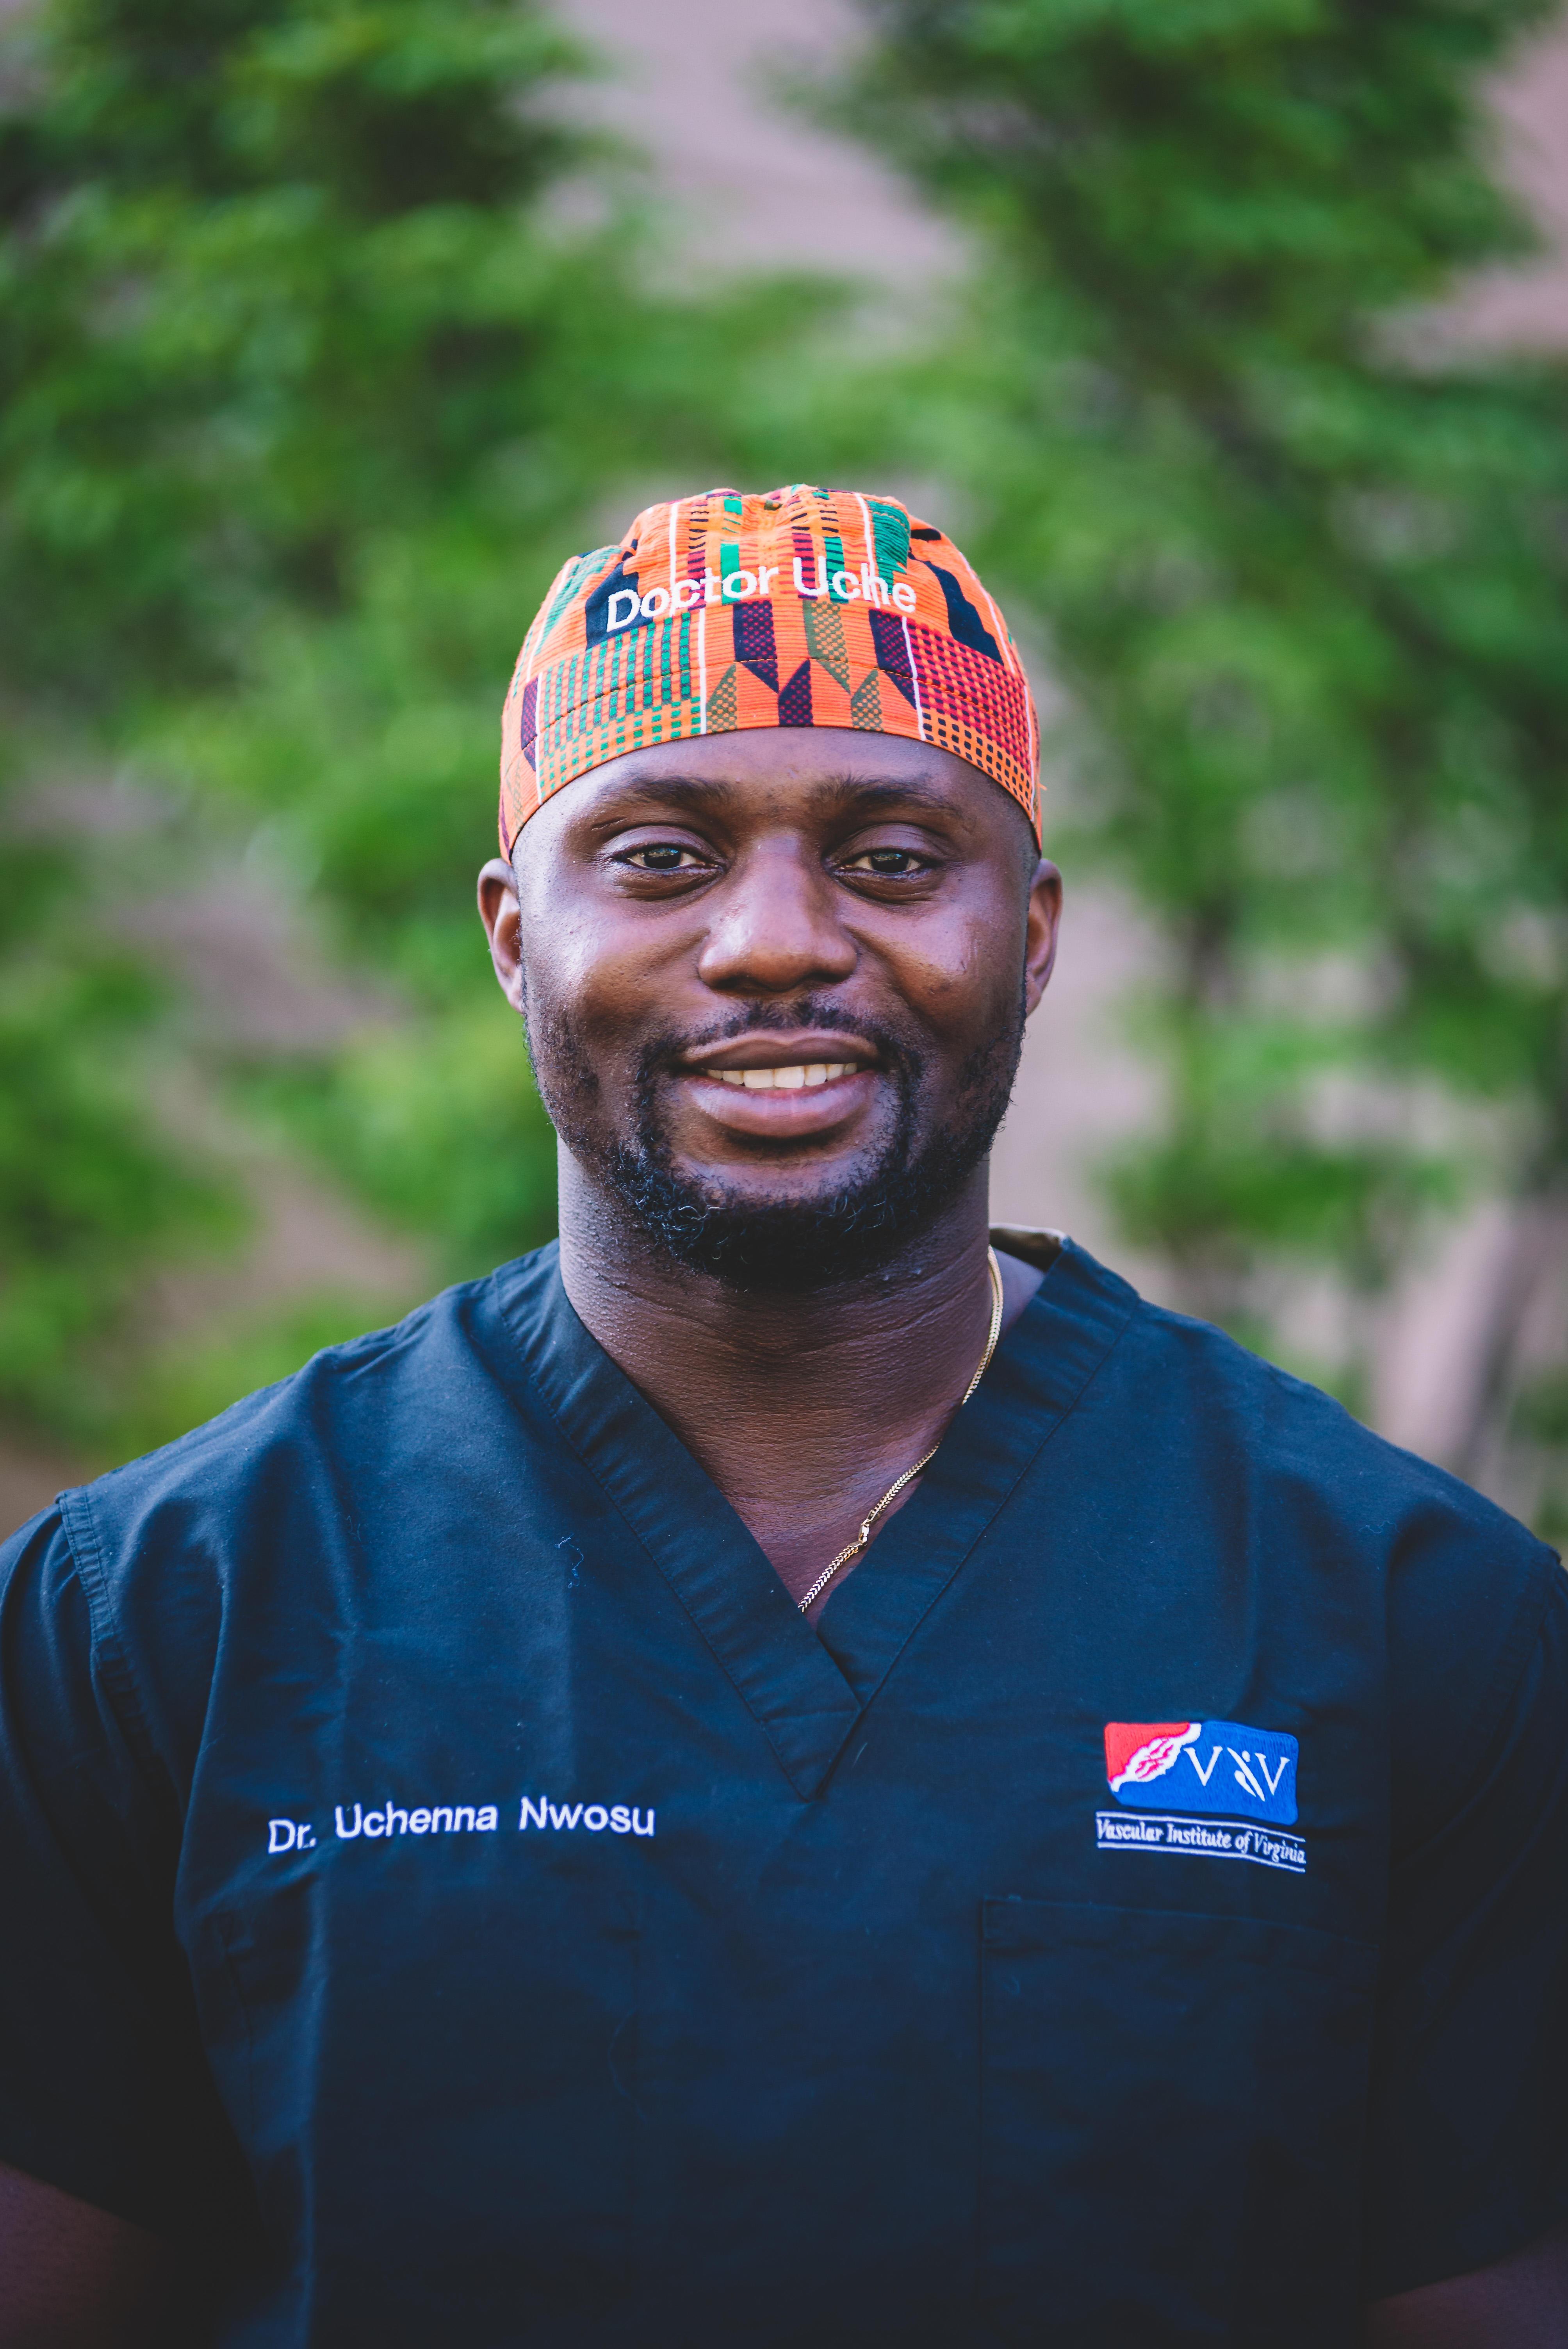 Uchenna Nwosu